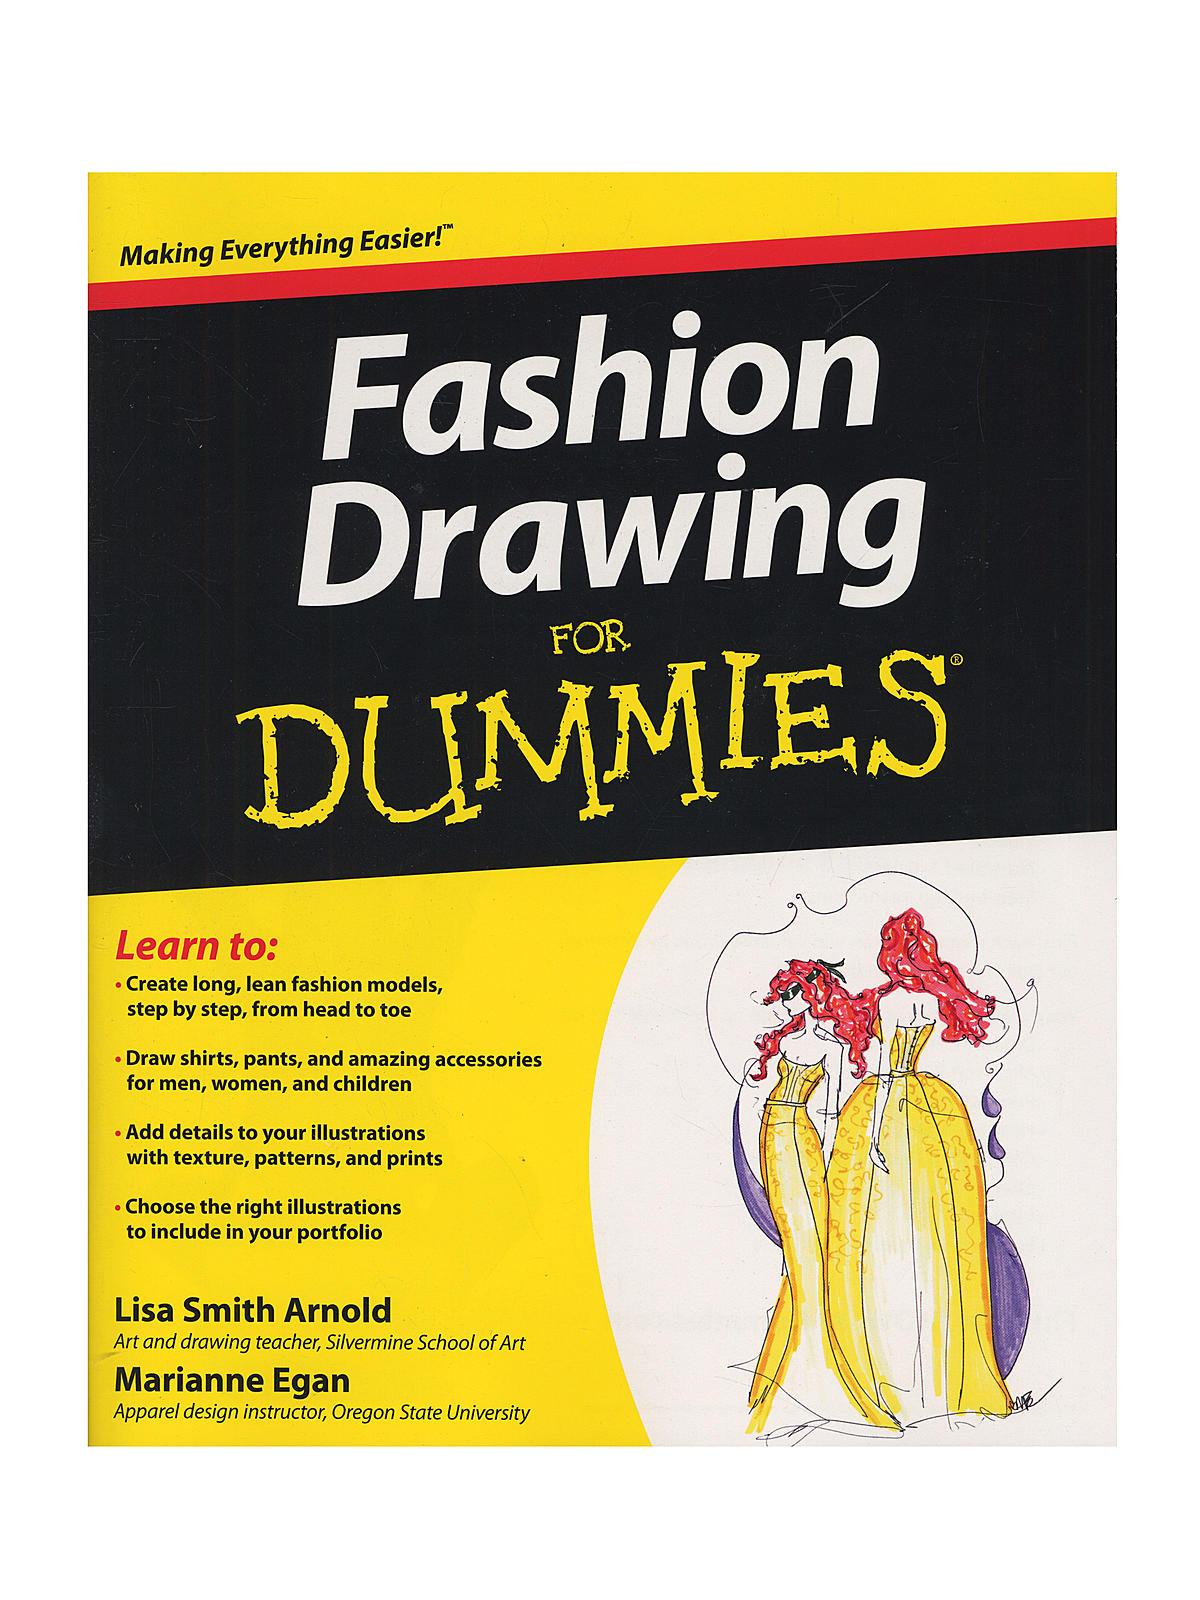 For dummies series misterart